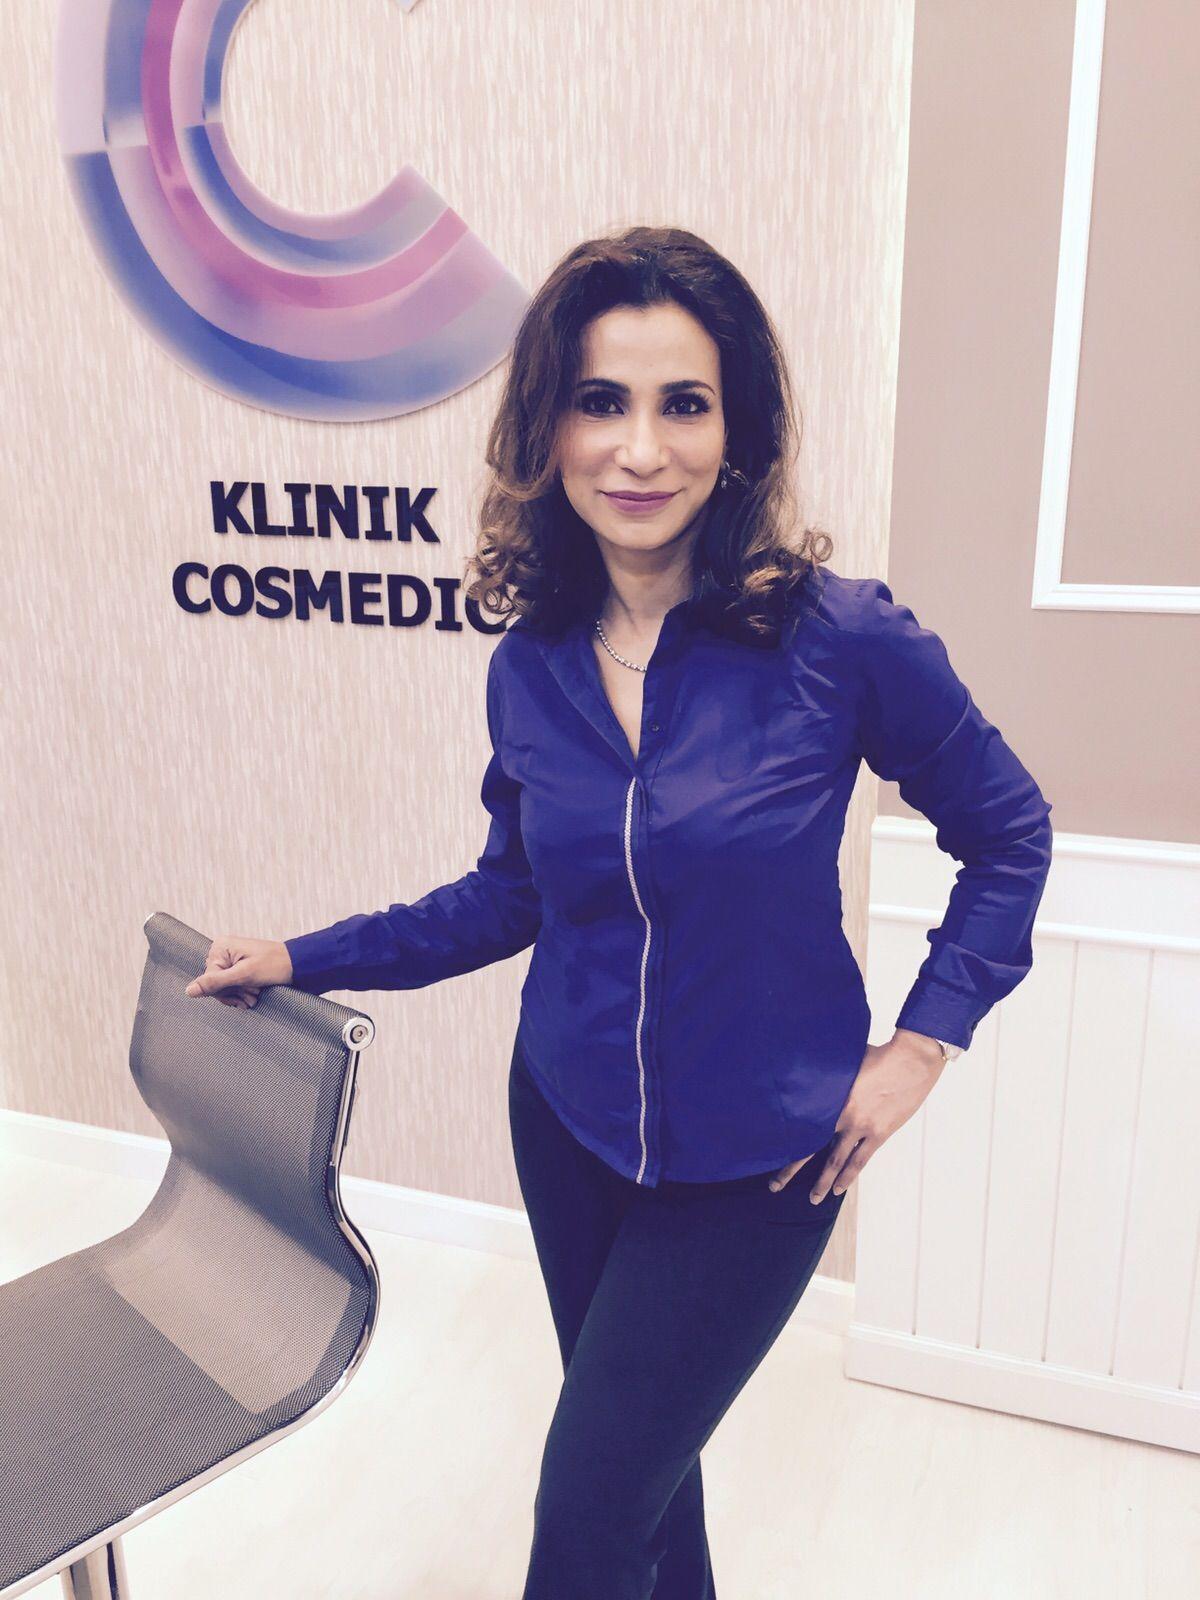 Cosmedic Aesthetic & Laser